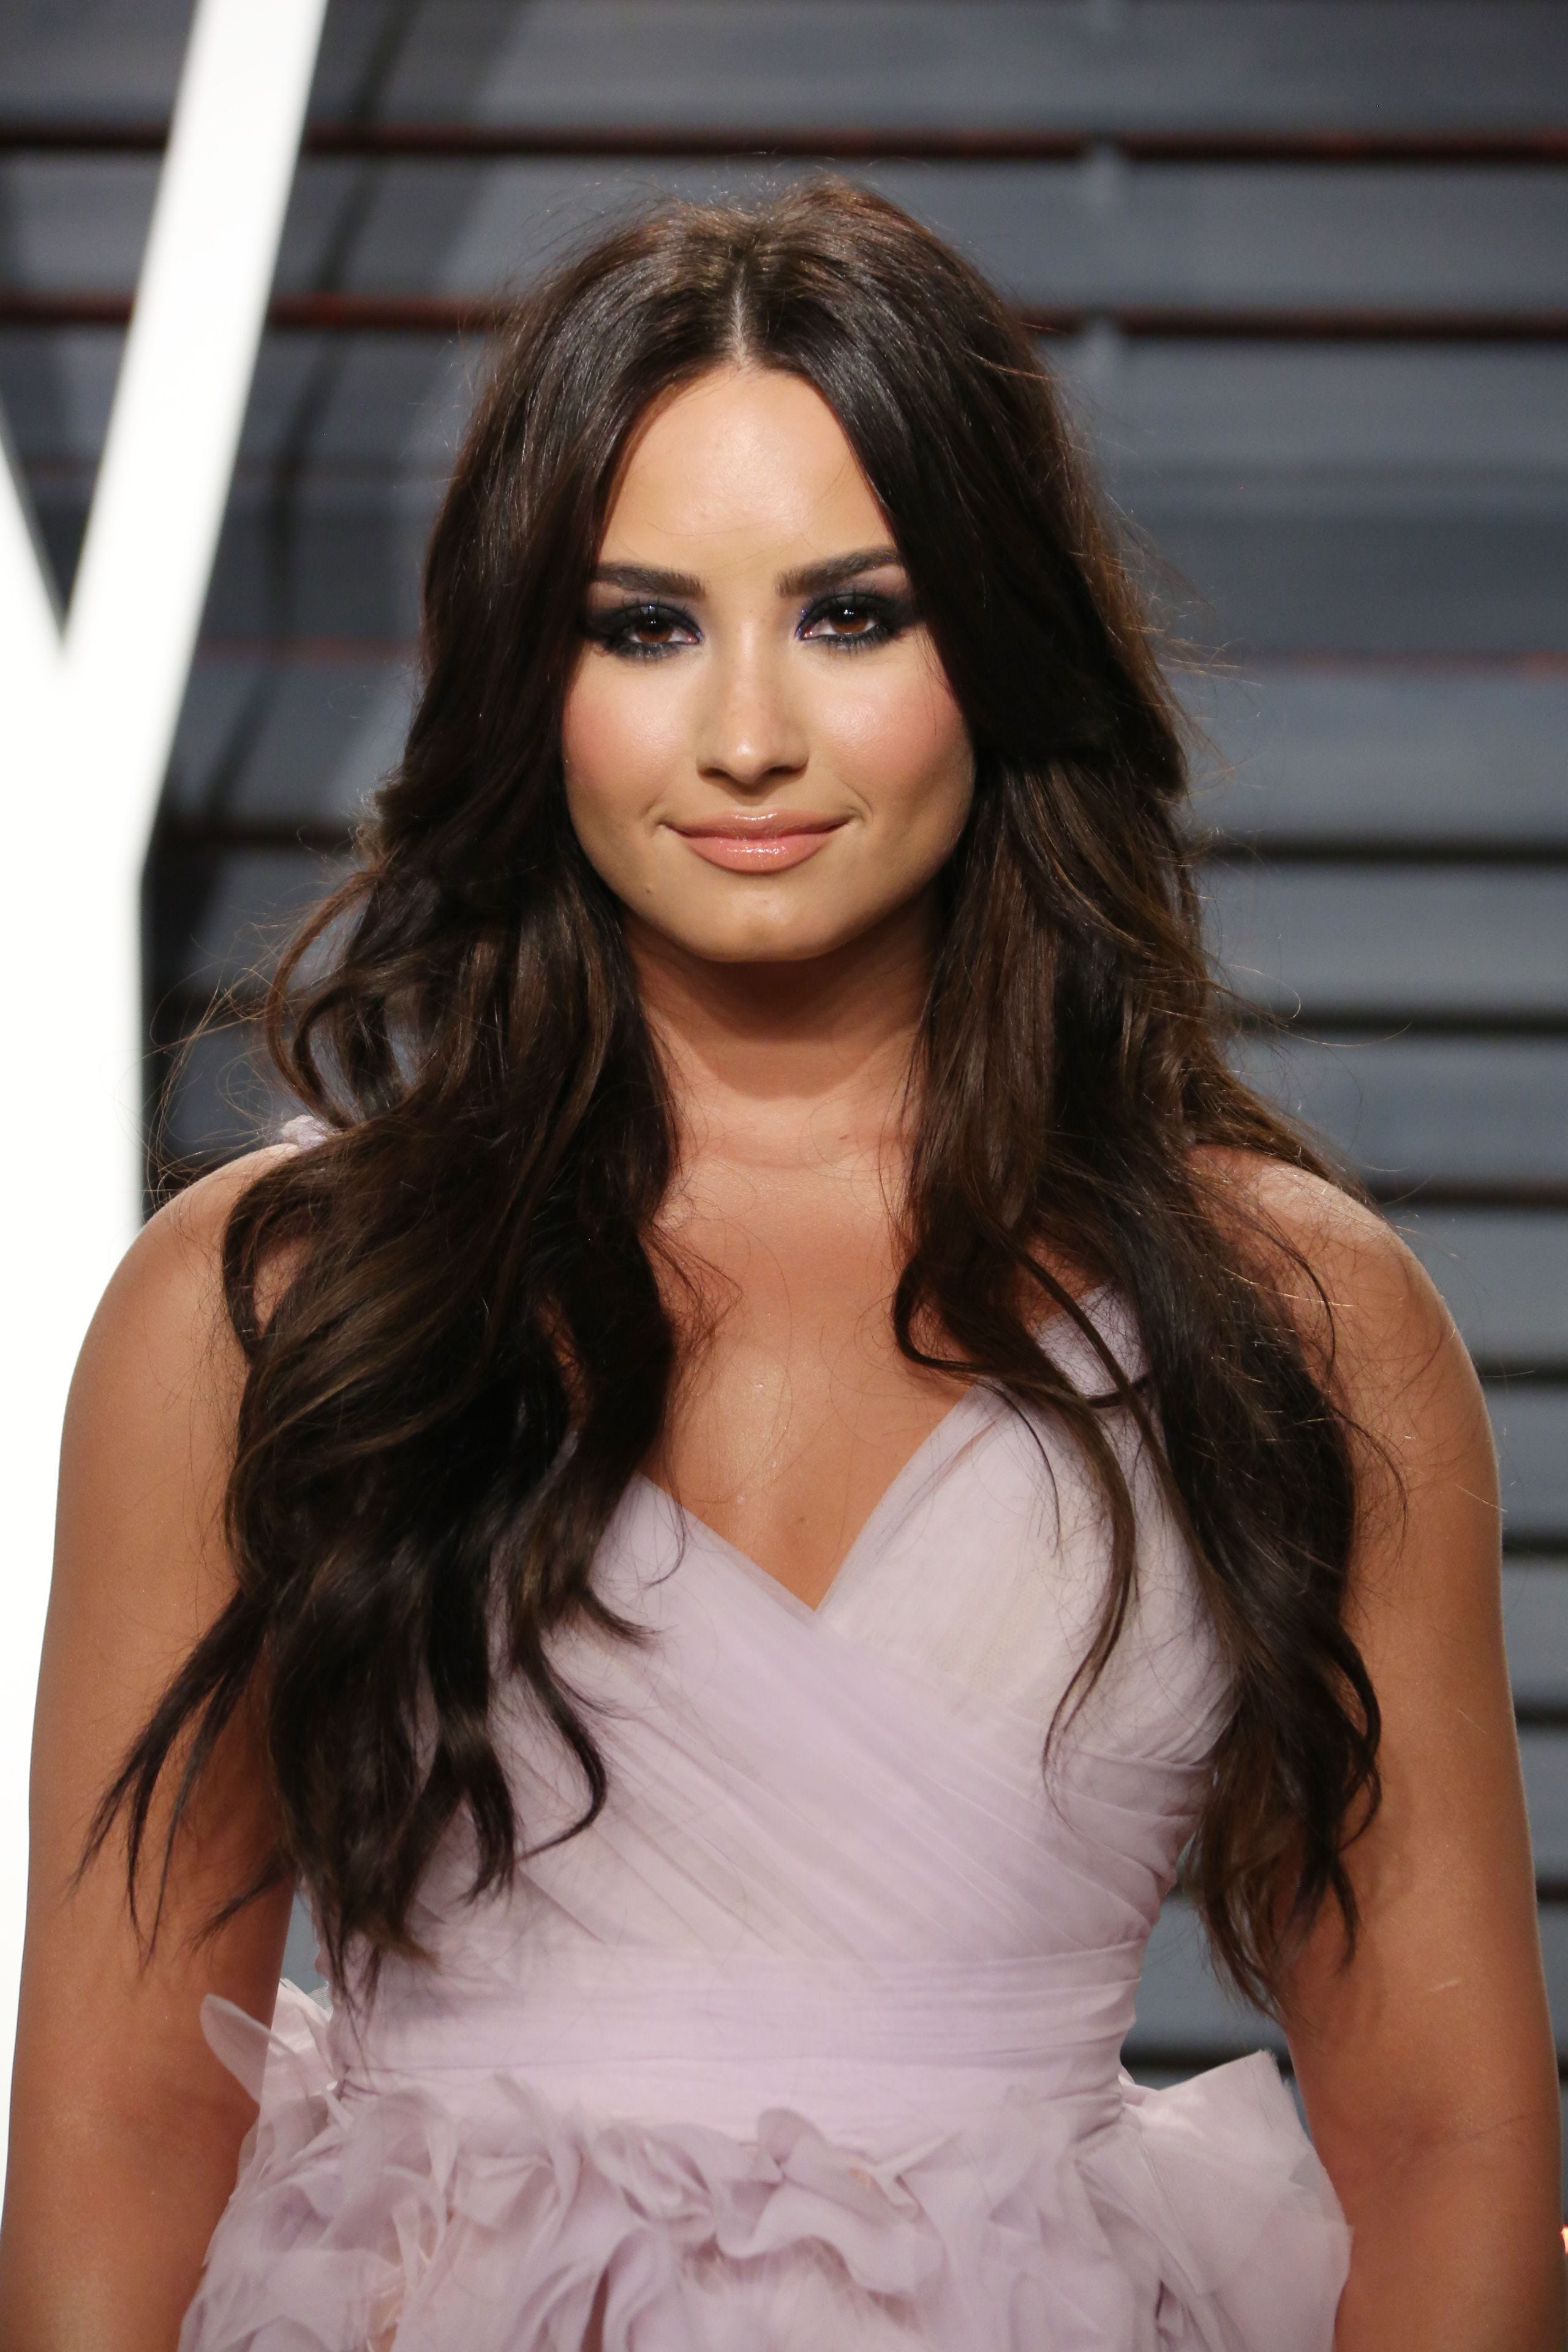 foto Is Demi Lovato Cutting Again